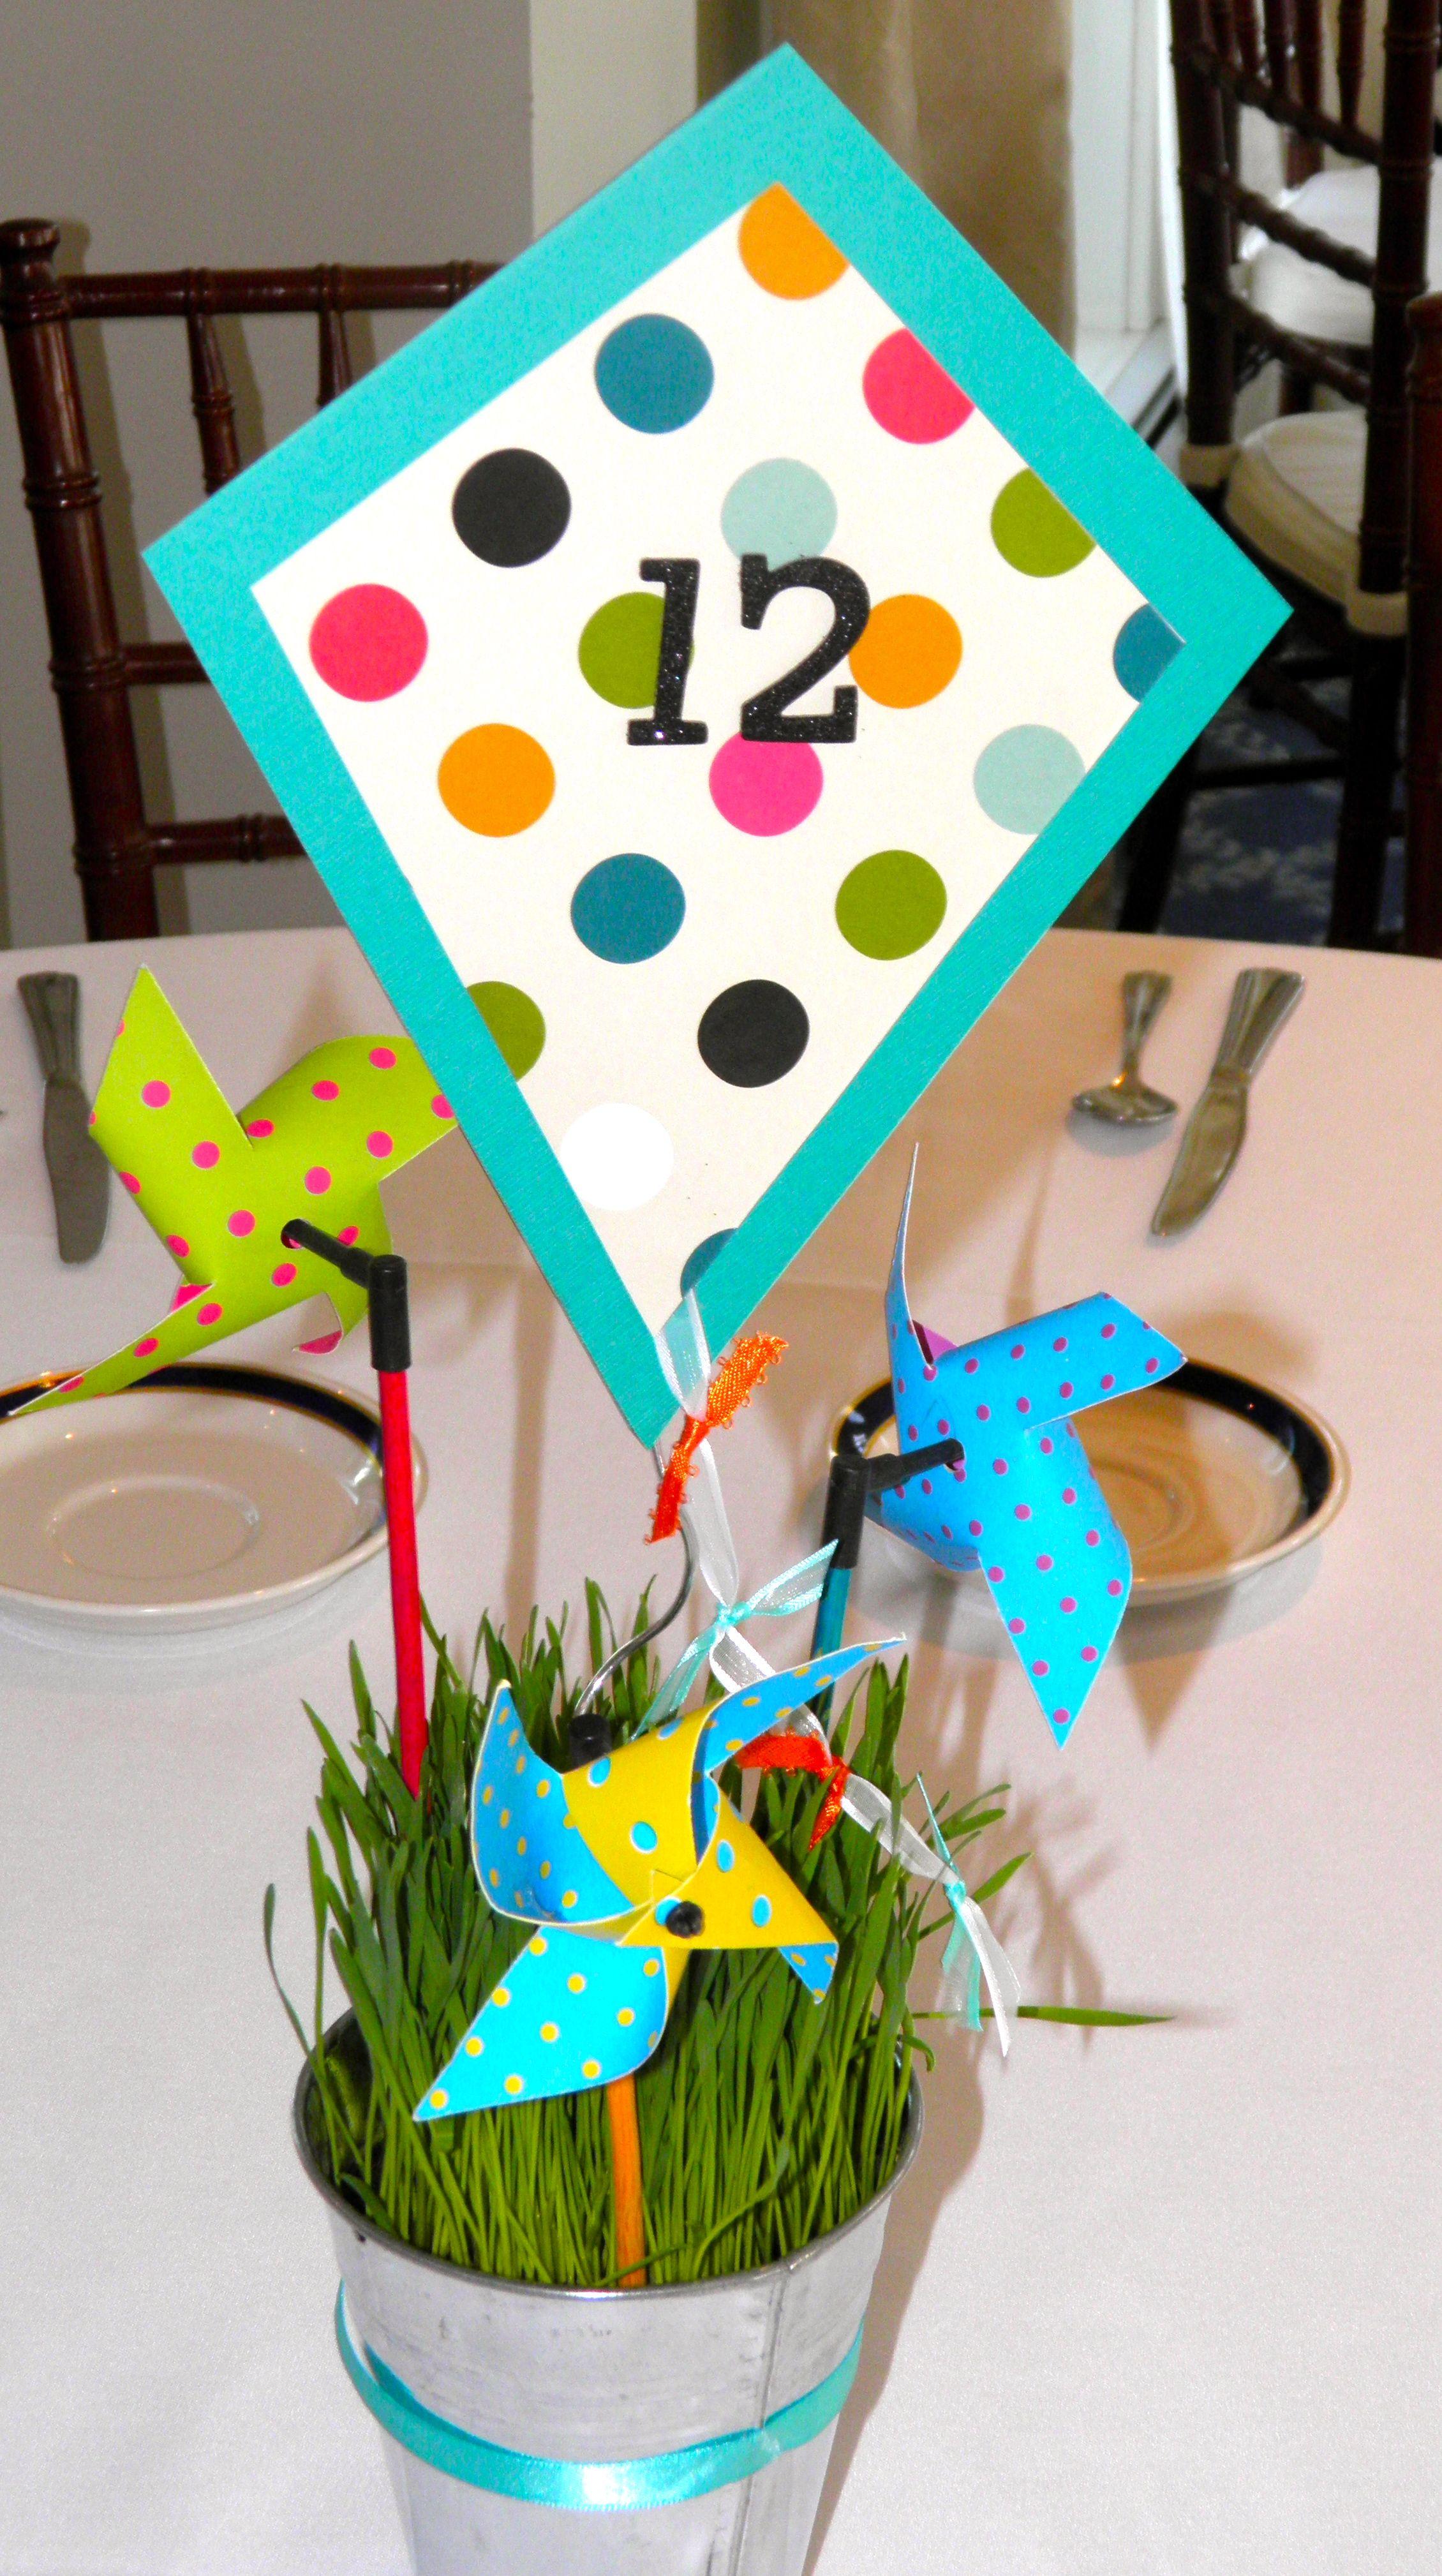 Kite pin wheel wheat grass center pieces annual gala for Decoration kite